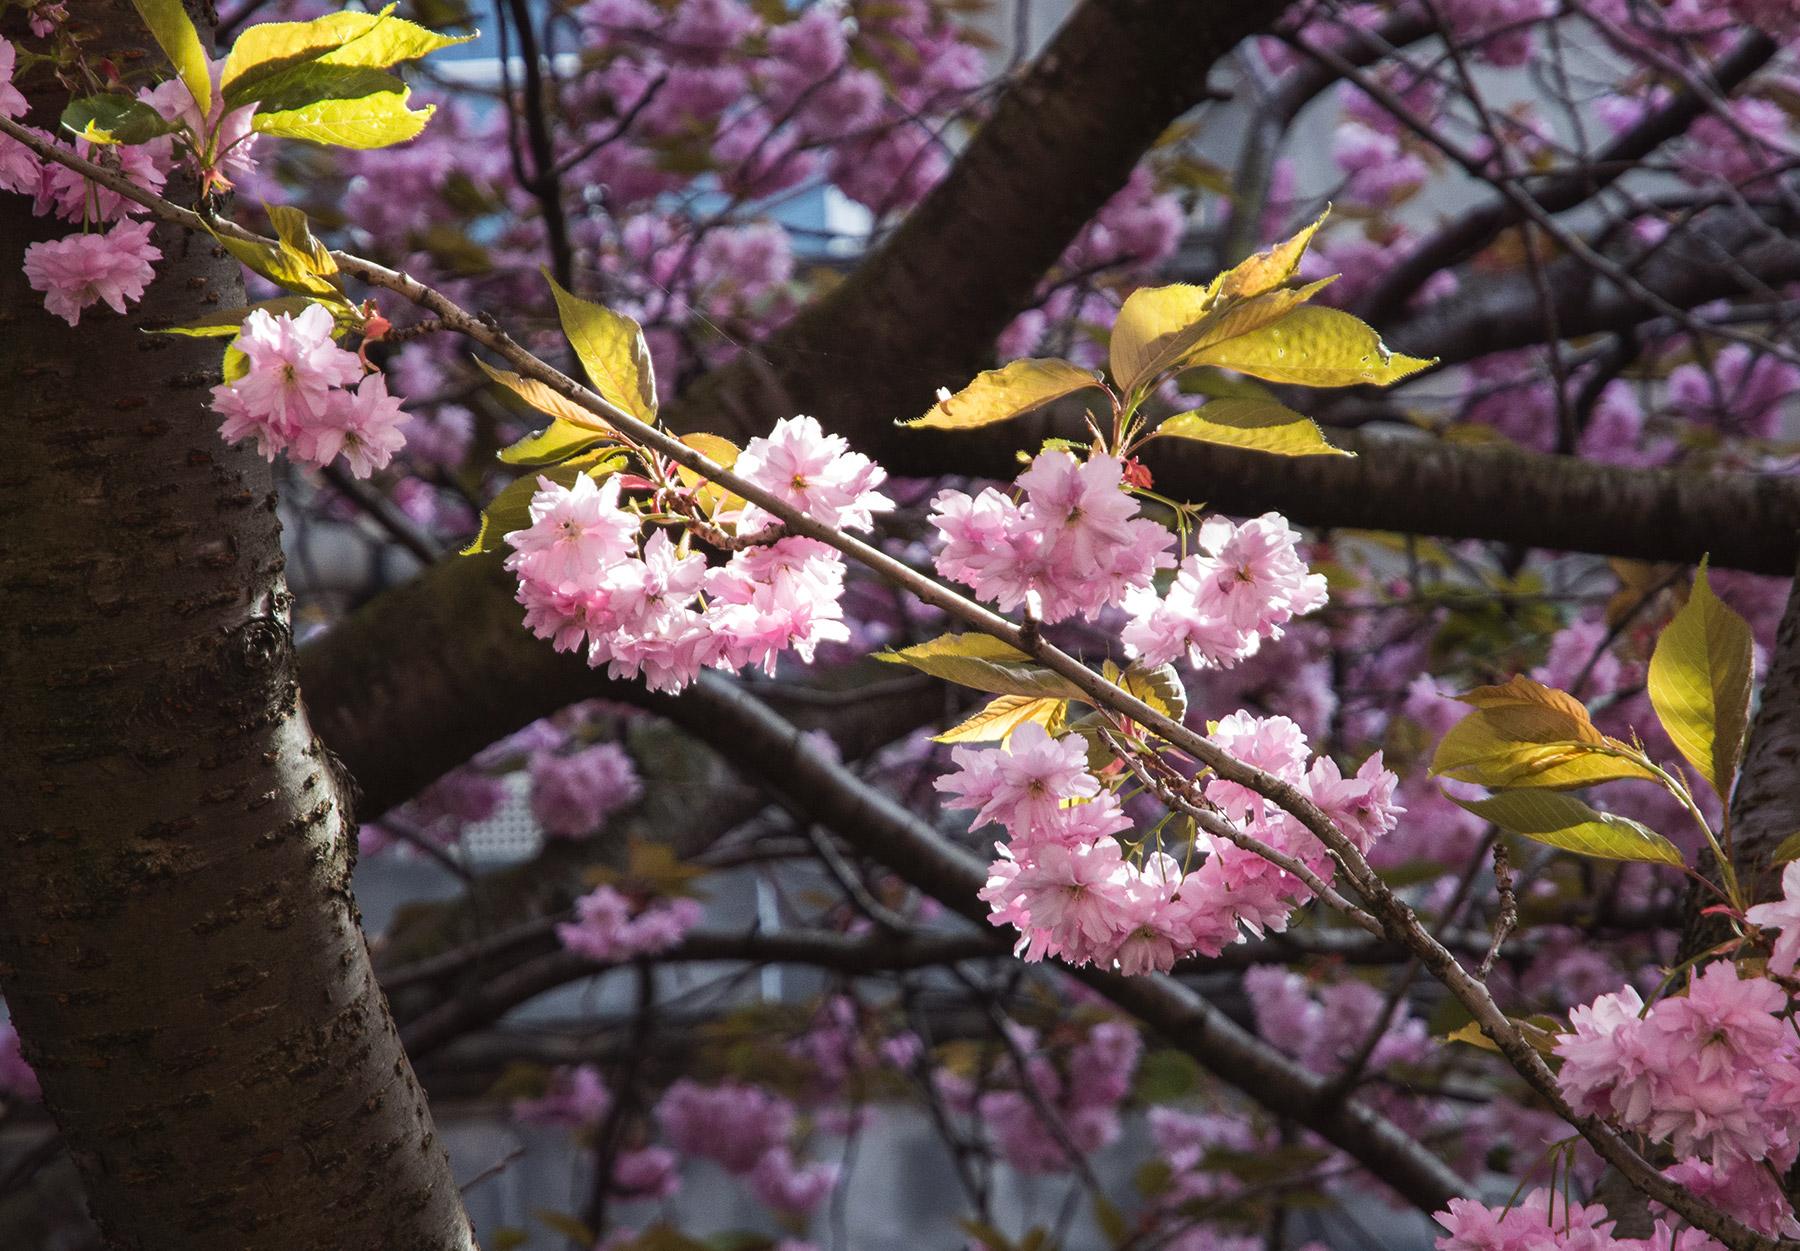 Closeup of pink blossom